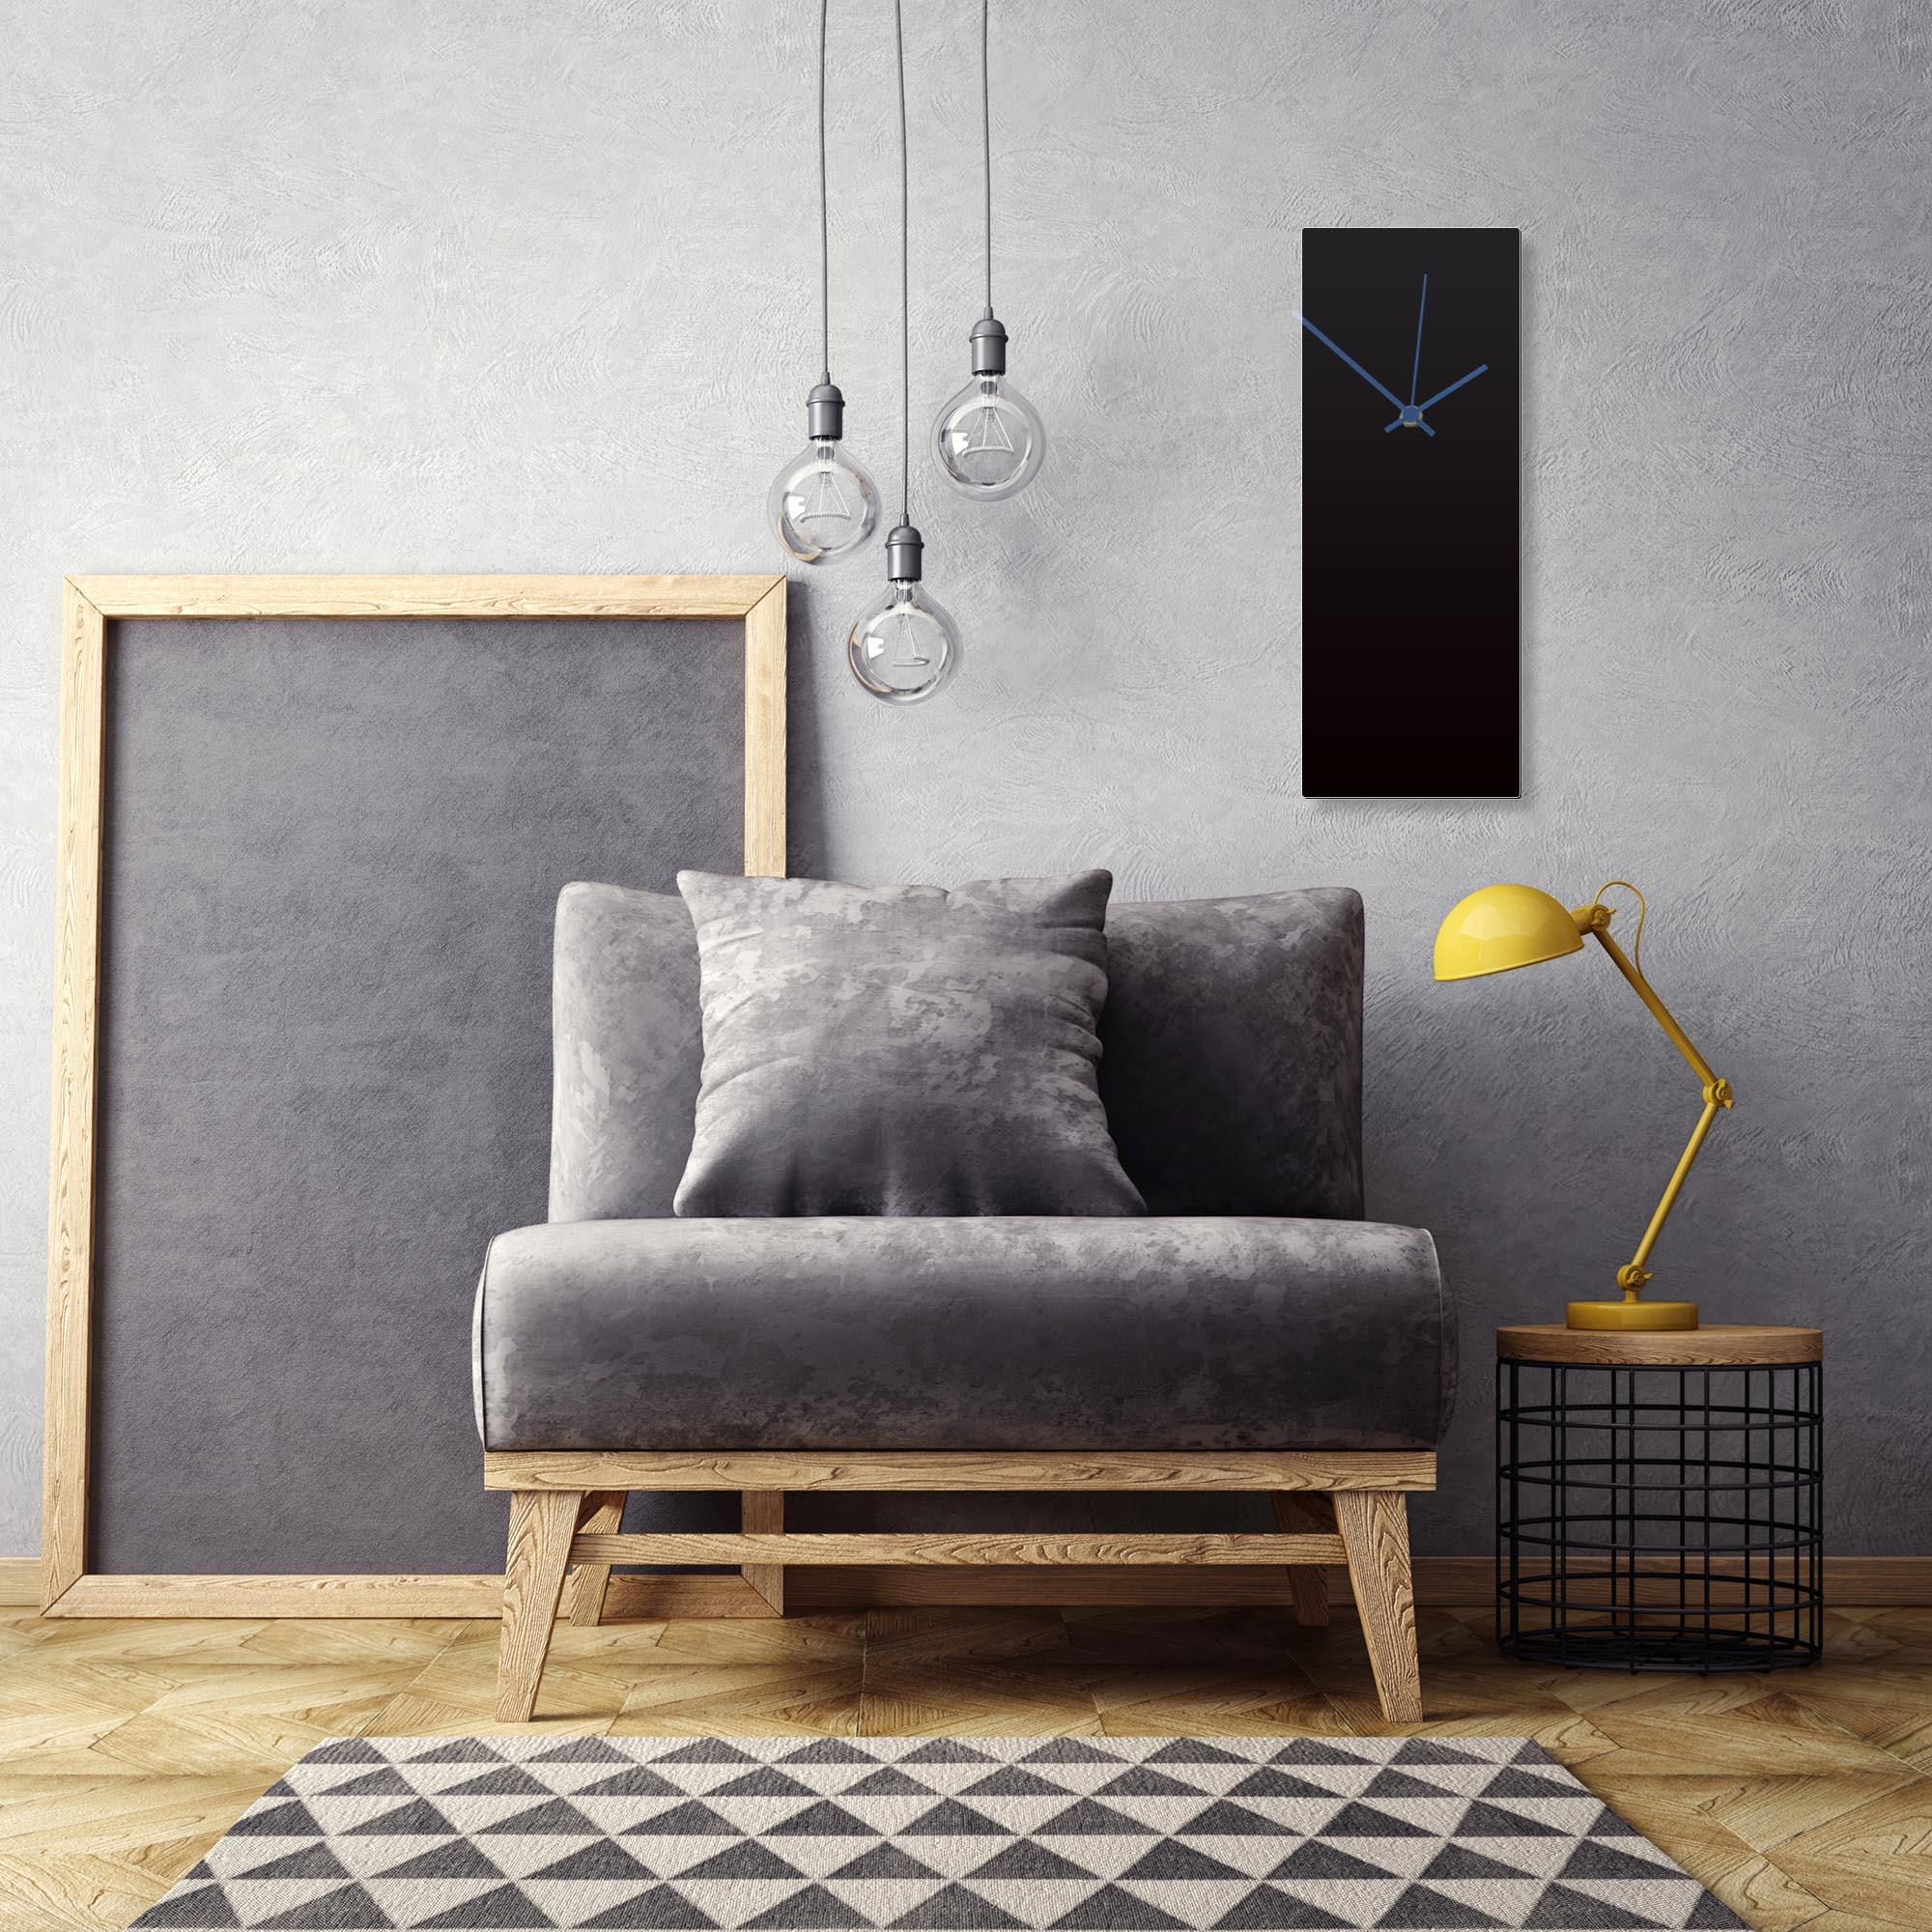 Blackout Blue Clock Large by Adam Schwoeppe Contemporary Clock on Aluminum Polymetal - Alternate View 1